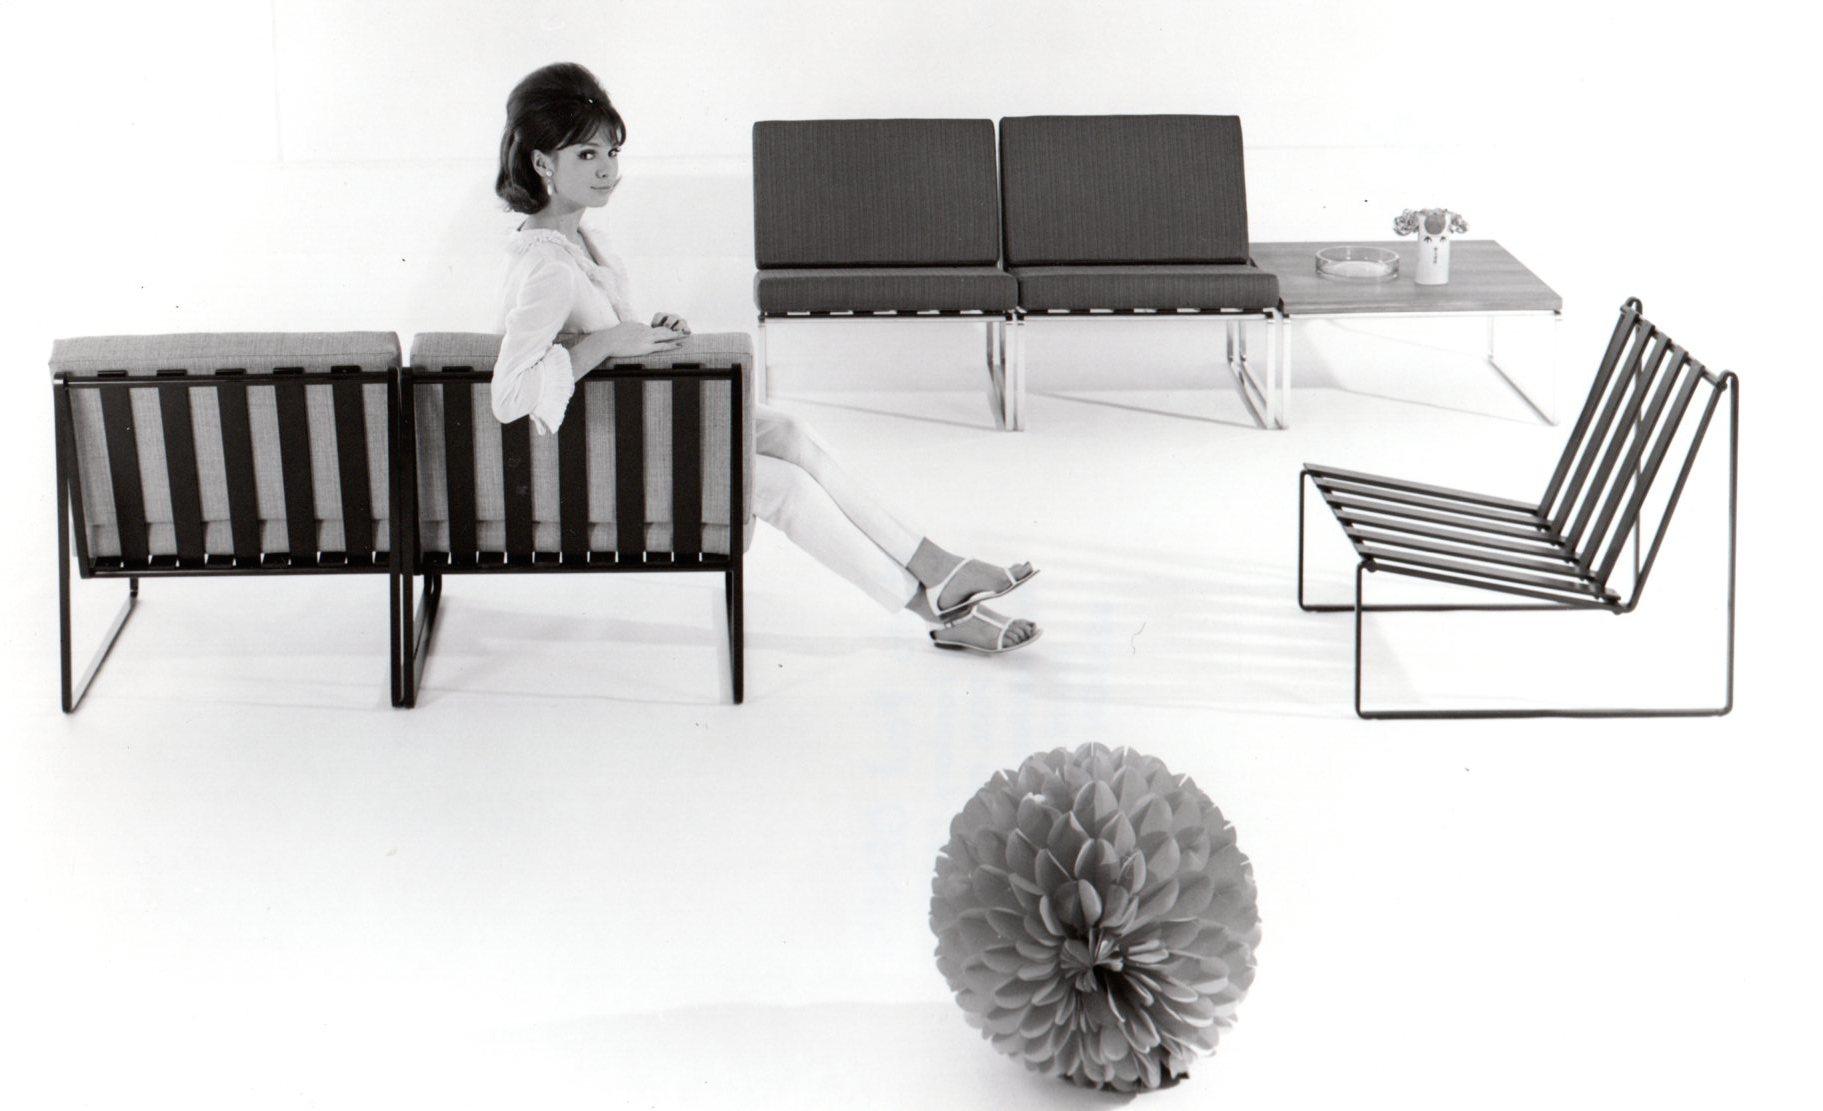 Photo Paul Genest. Table model 869, 1962